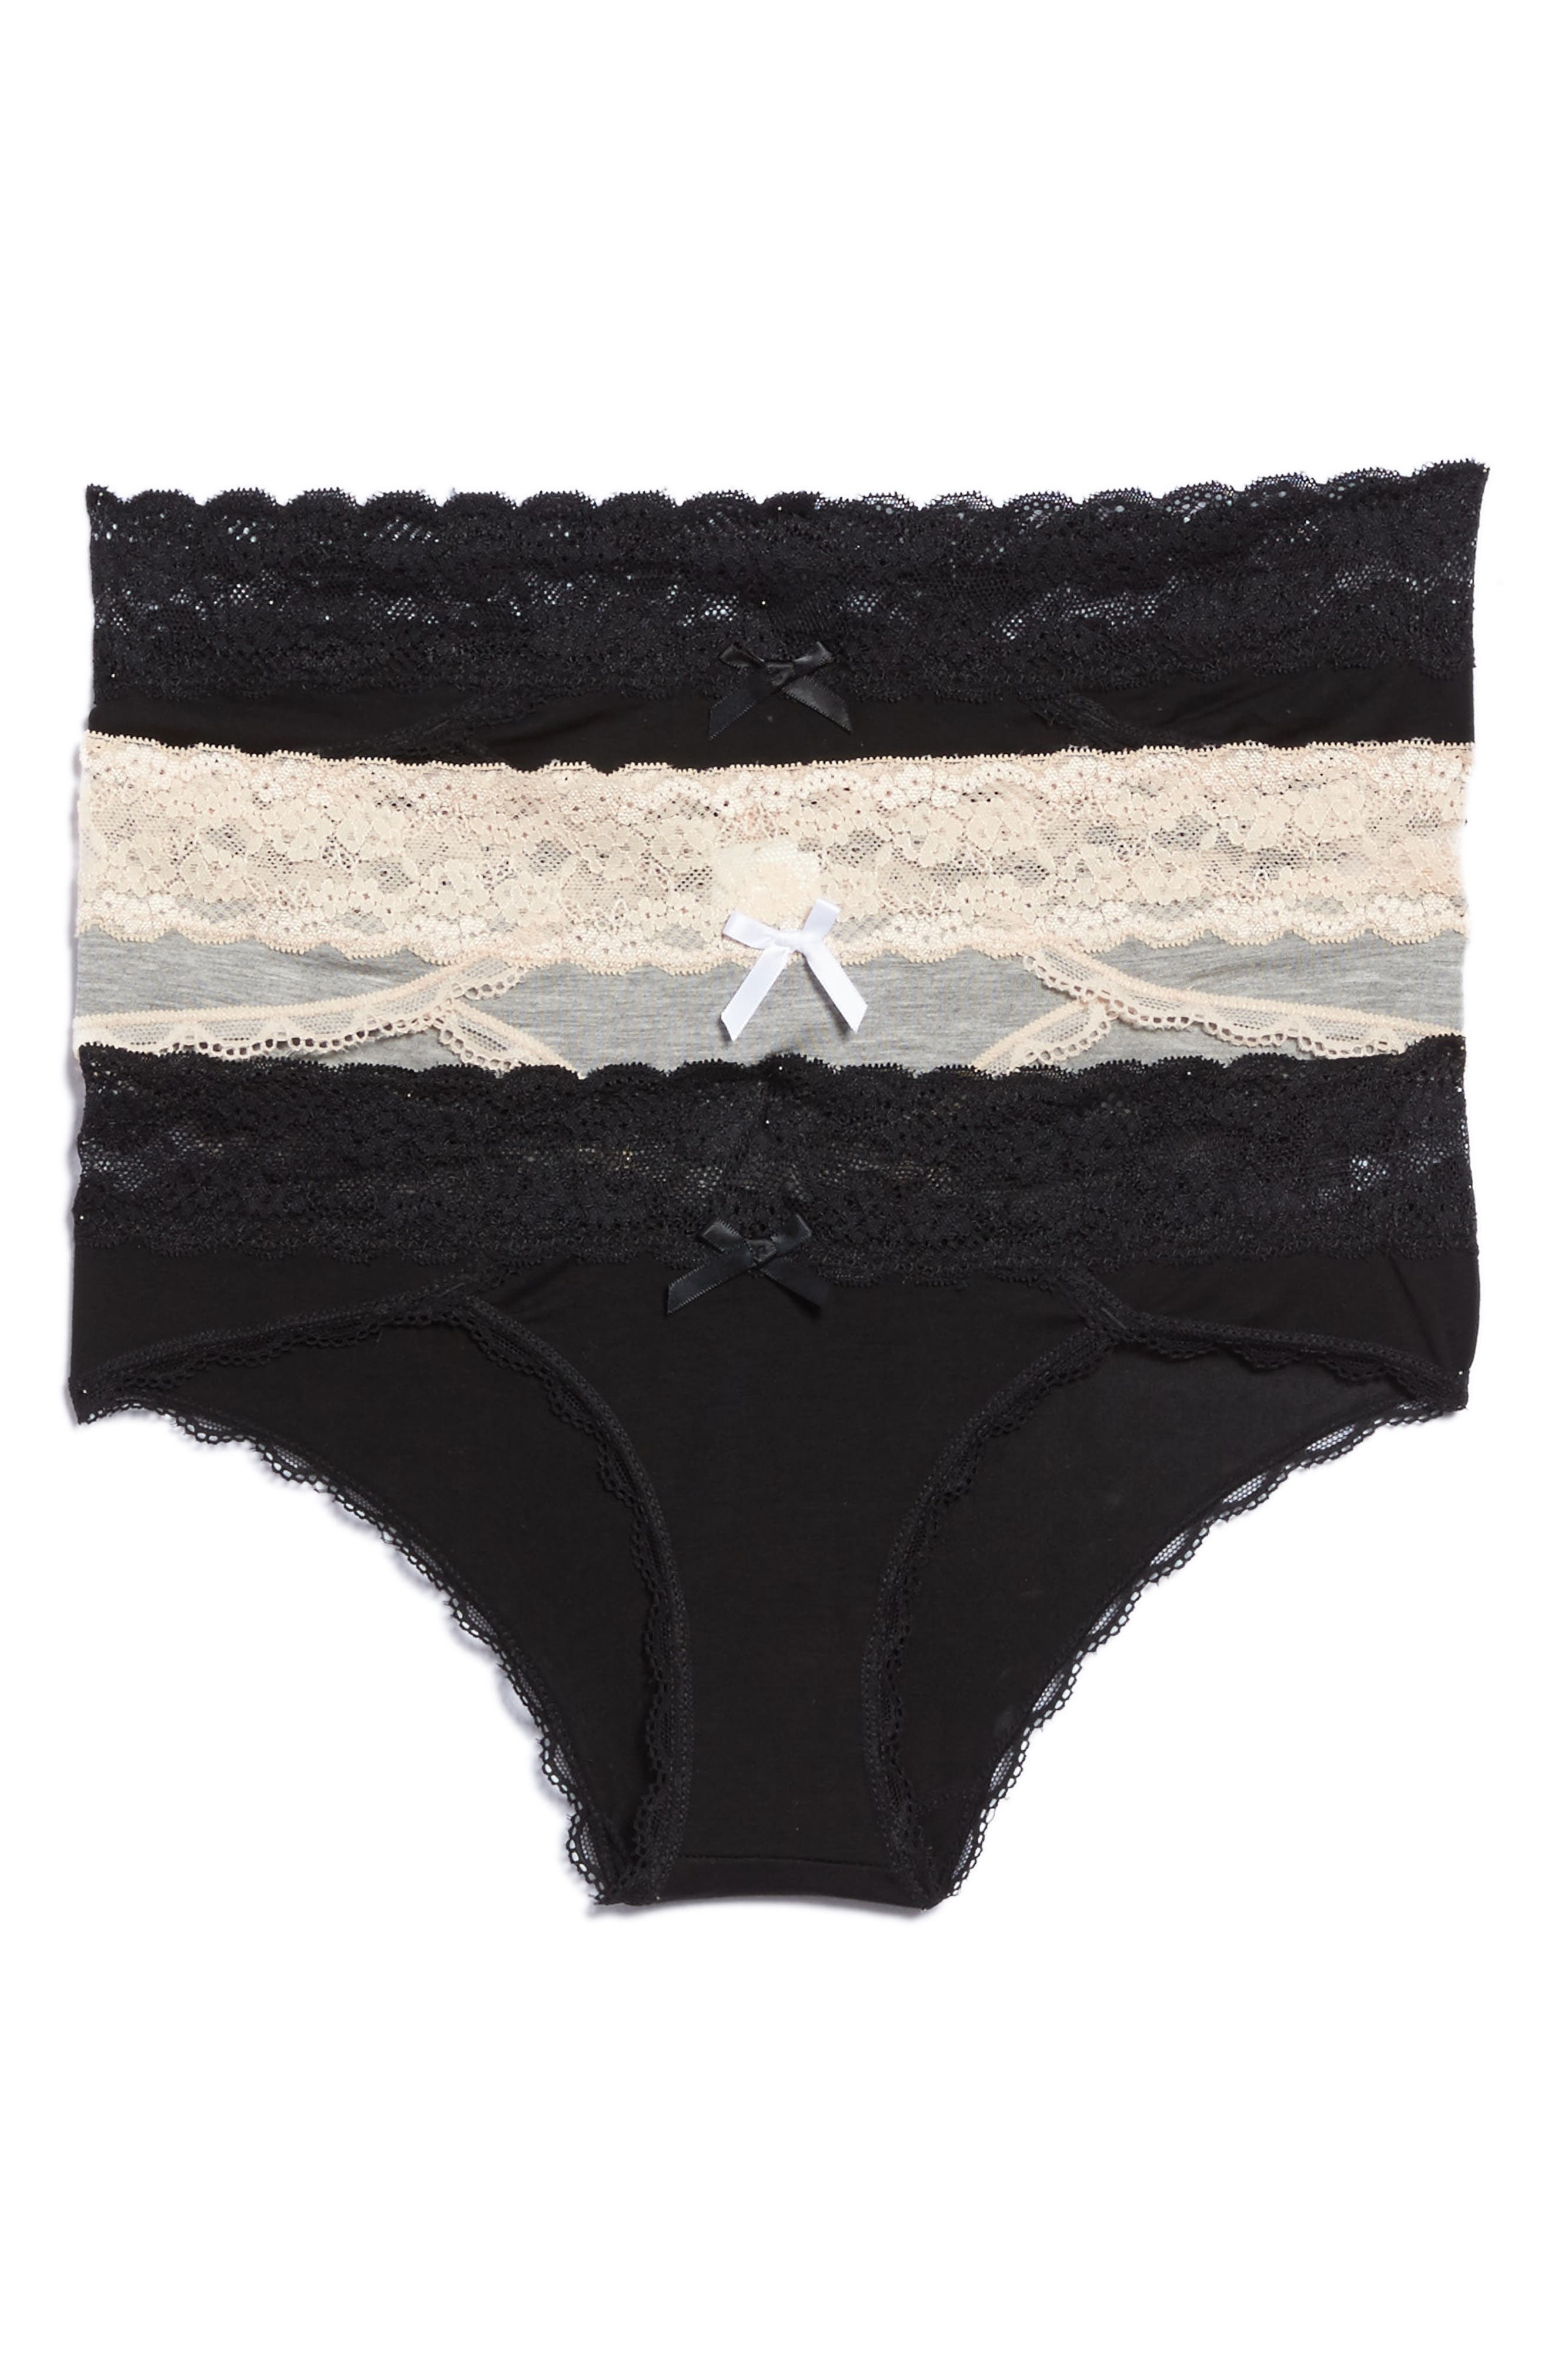 Main Image - Honeydew Intimates 3-Pack Hipster Panties